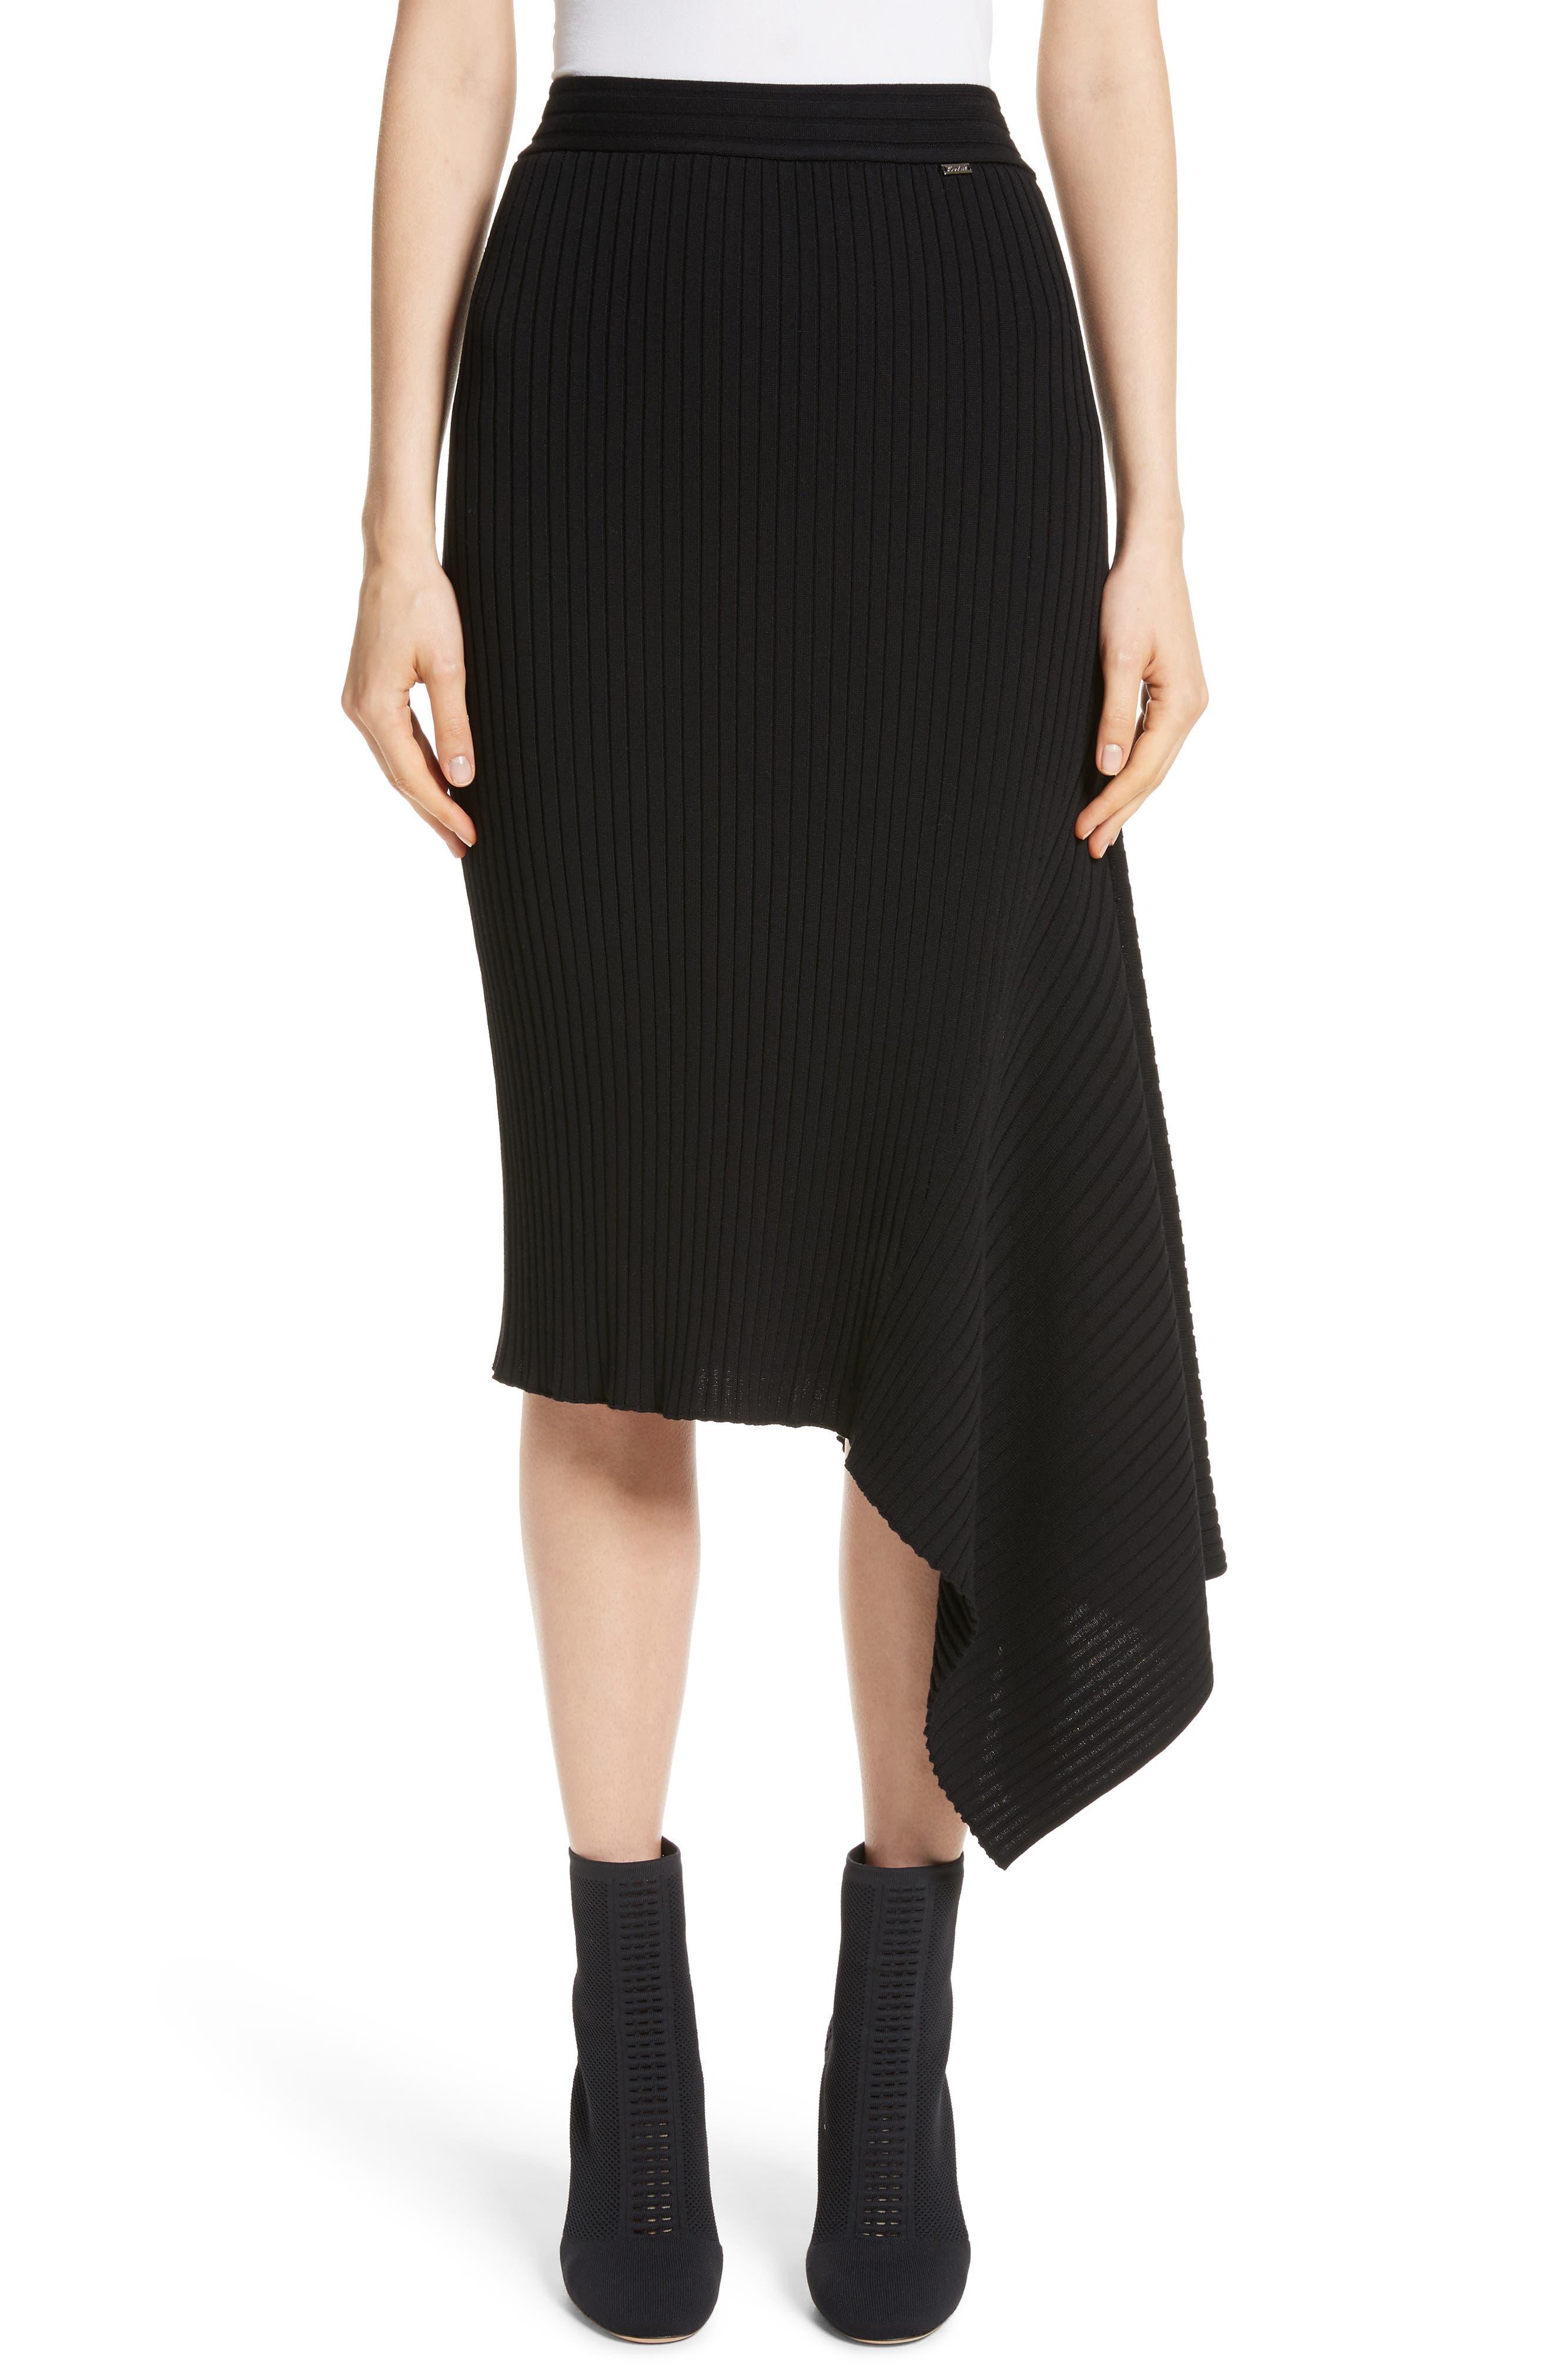 Main Image - St. John Collection Flat Rib Knit Asymmetrical Skirt